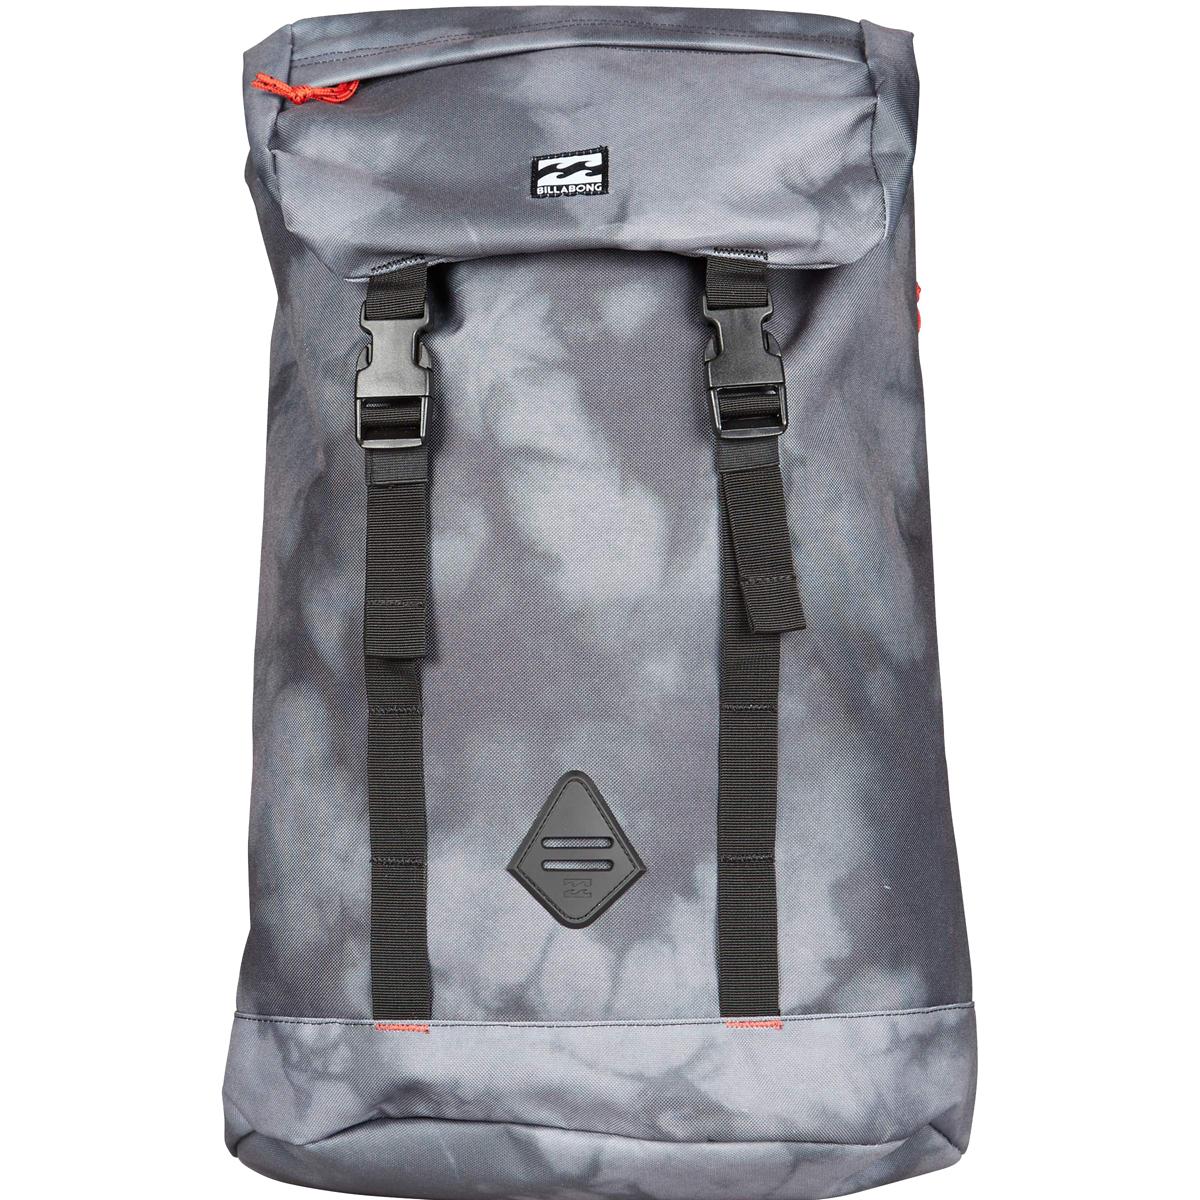 Рюкзак городской Billabong Track Pack, цвет: серый рюкзак городской billabong all day pack цвет черный серый